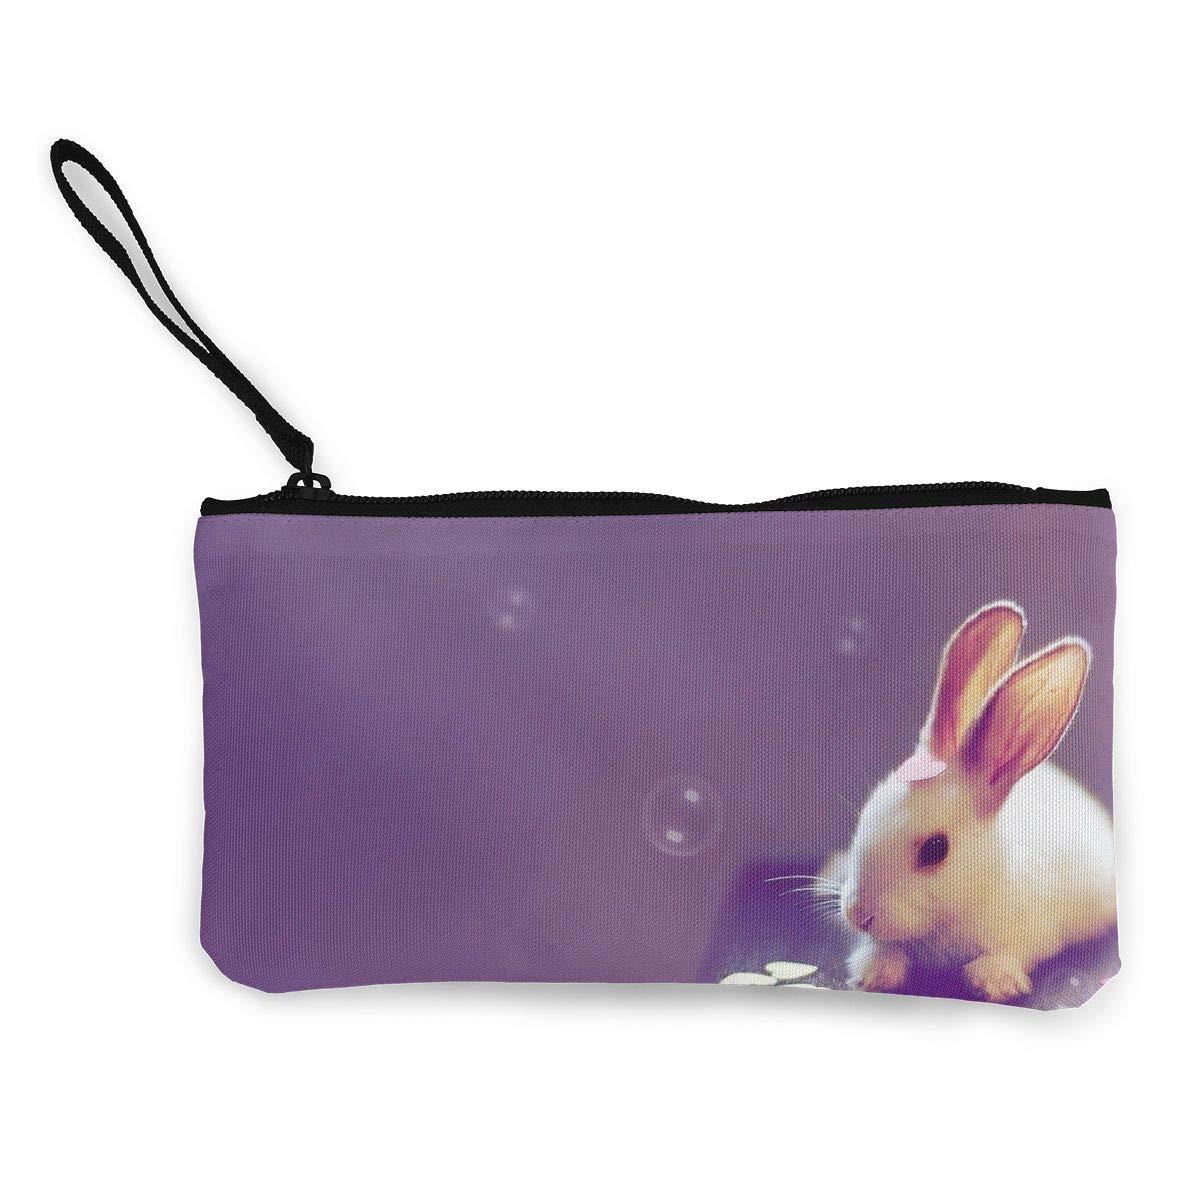 DH14hjsdDEE Purple Zipper Canvas Coin Purse Wallet Cellphone Bag With Handle Make Up Bag